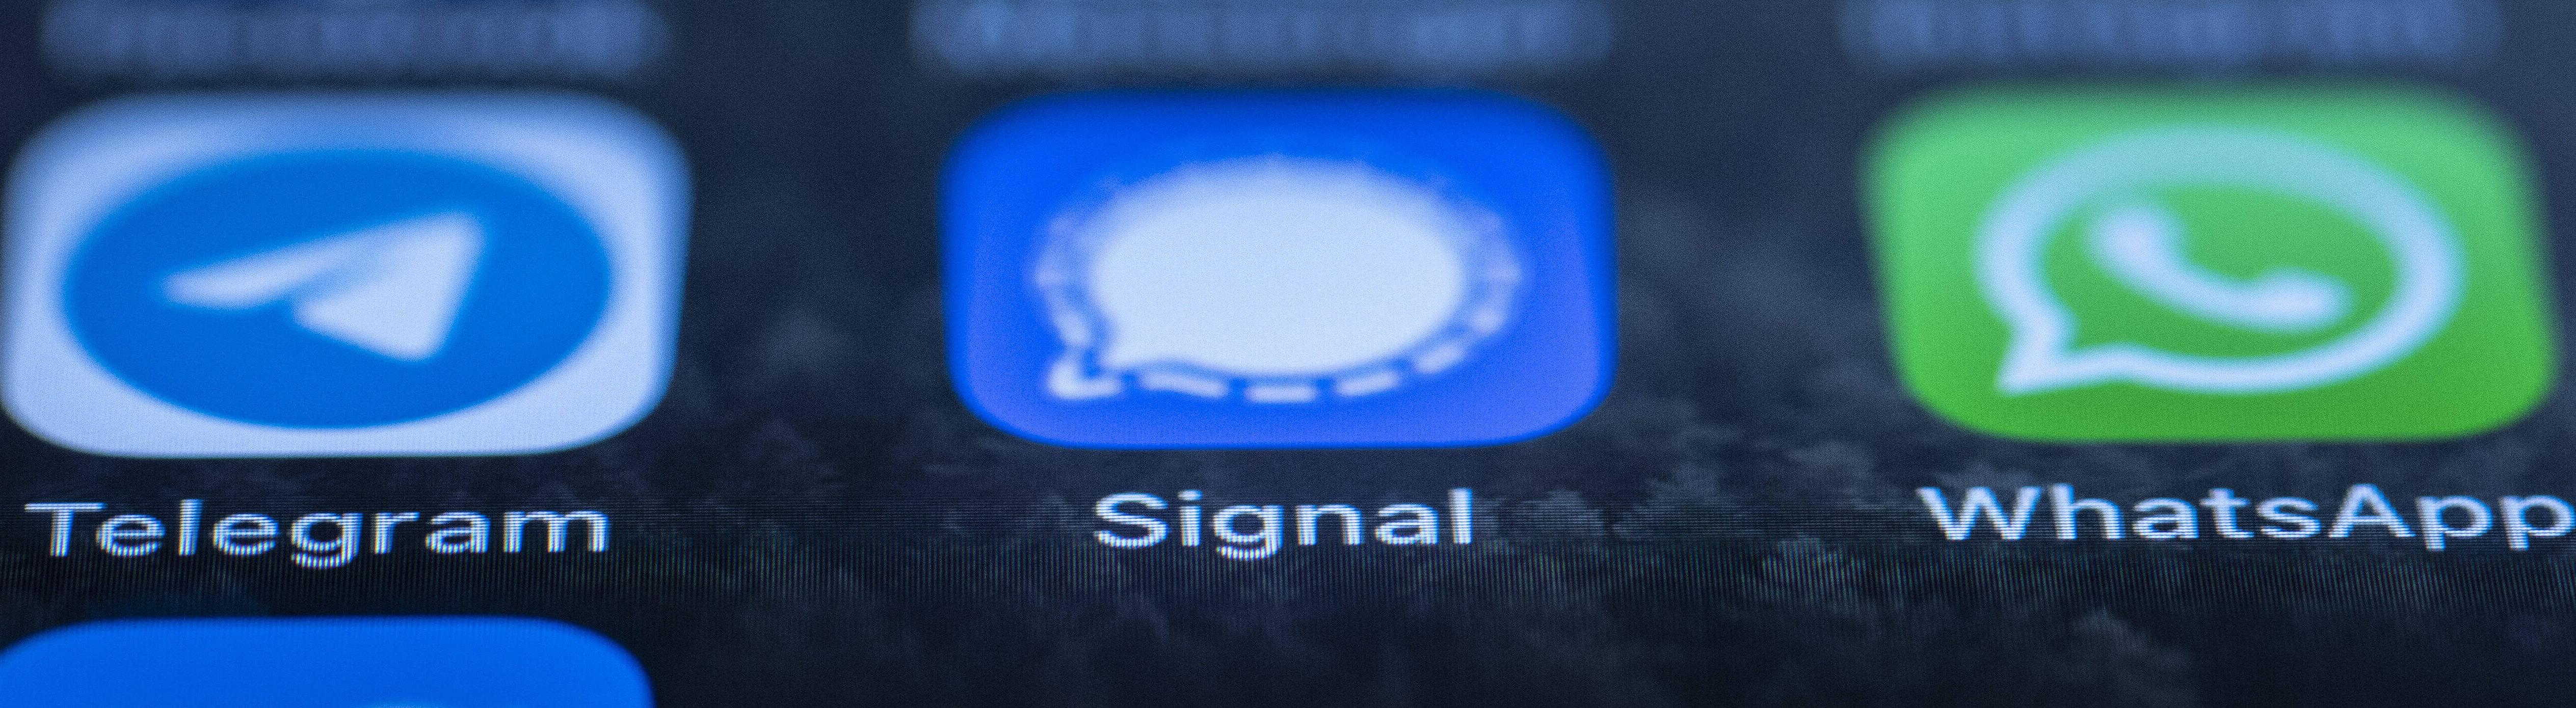 Handydisplay mit verschiedenen Messengerdiensten